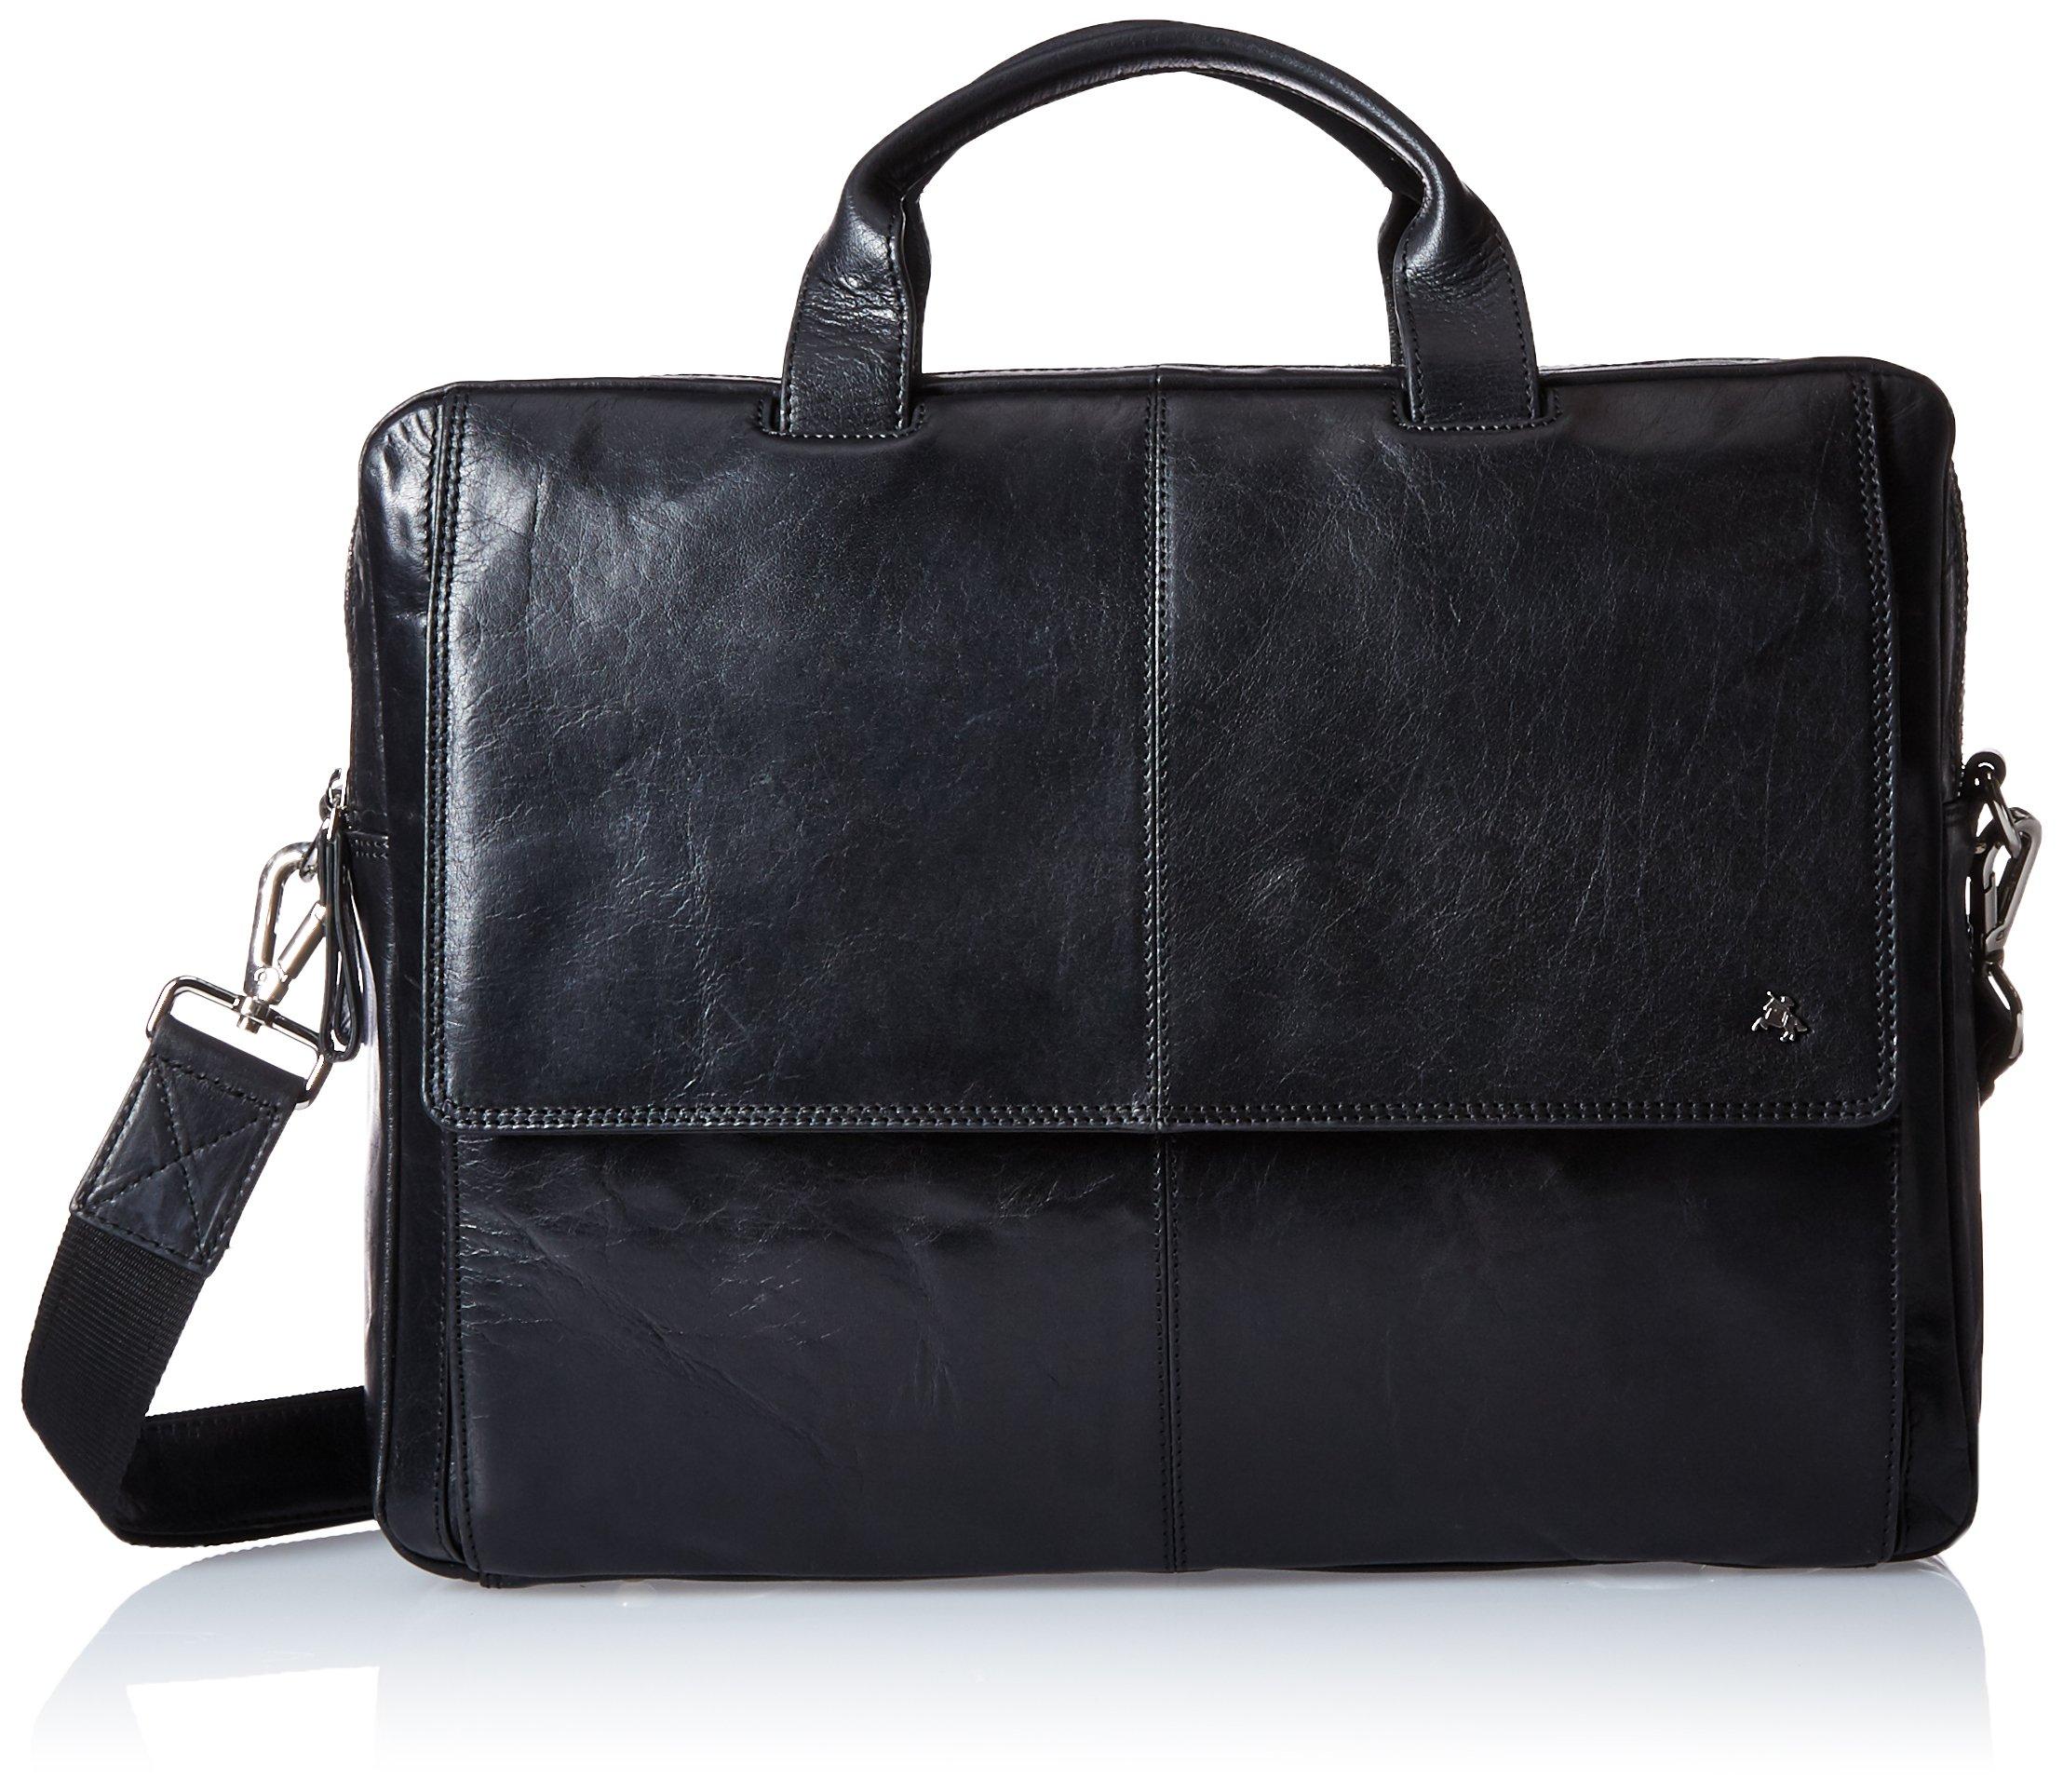 Visconti Leather (Up To 15 Inch) Laptop Computer Case Shoulder Messenger Bag, Black, One Size